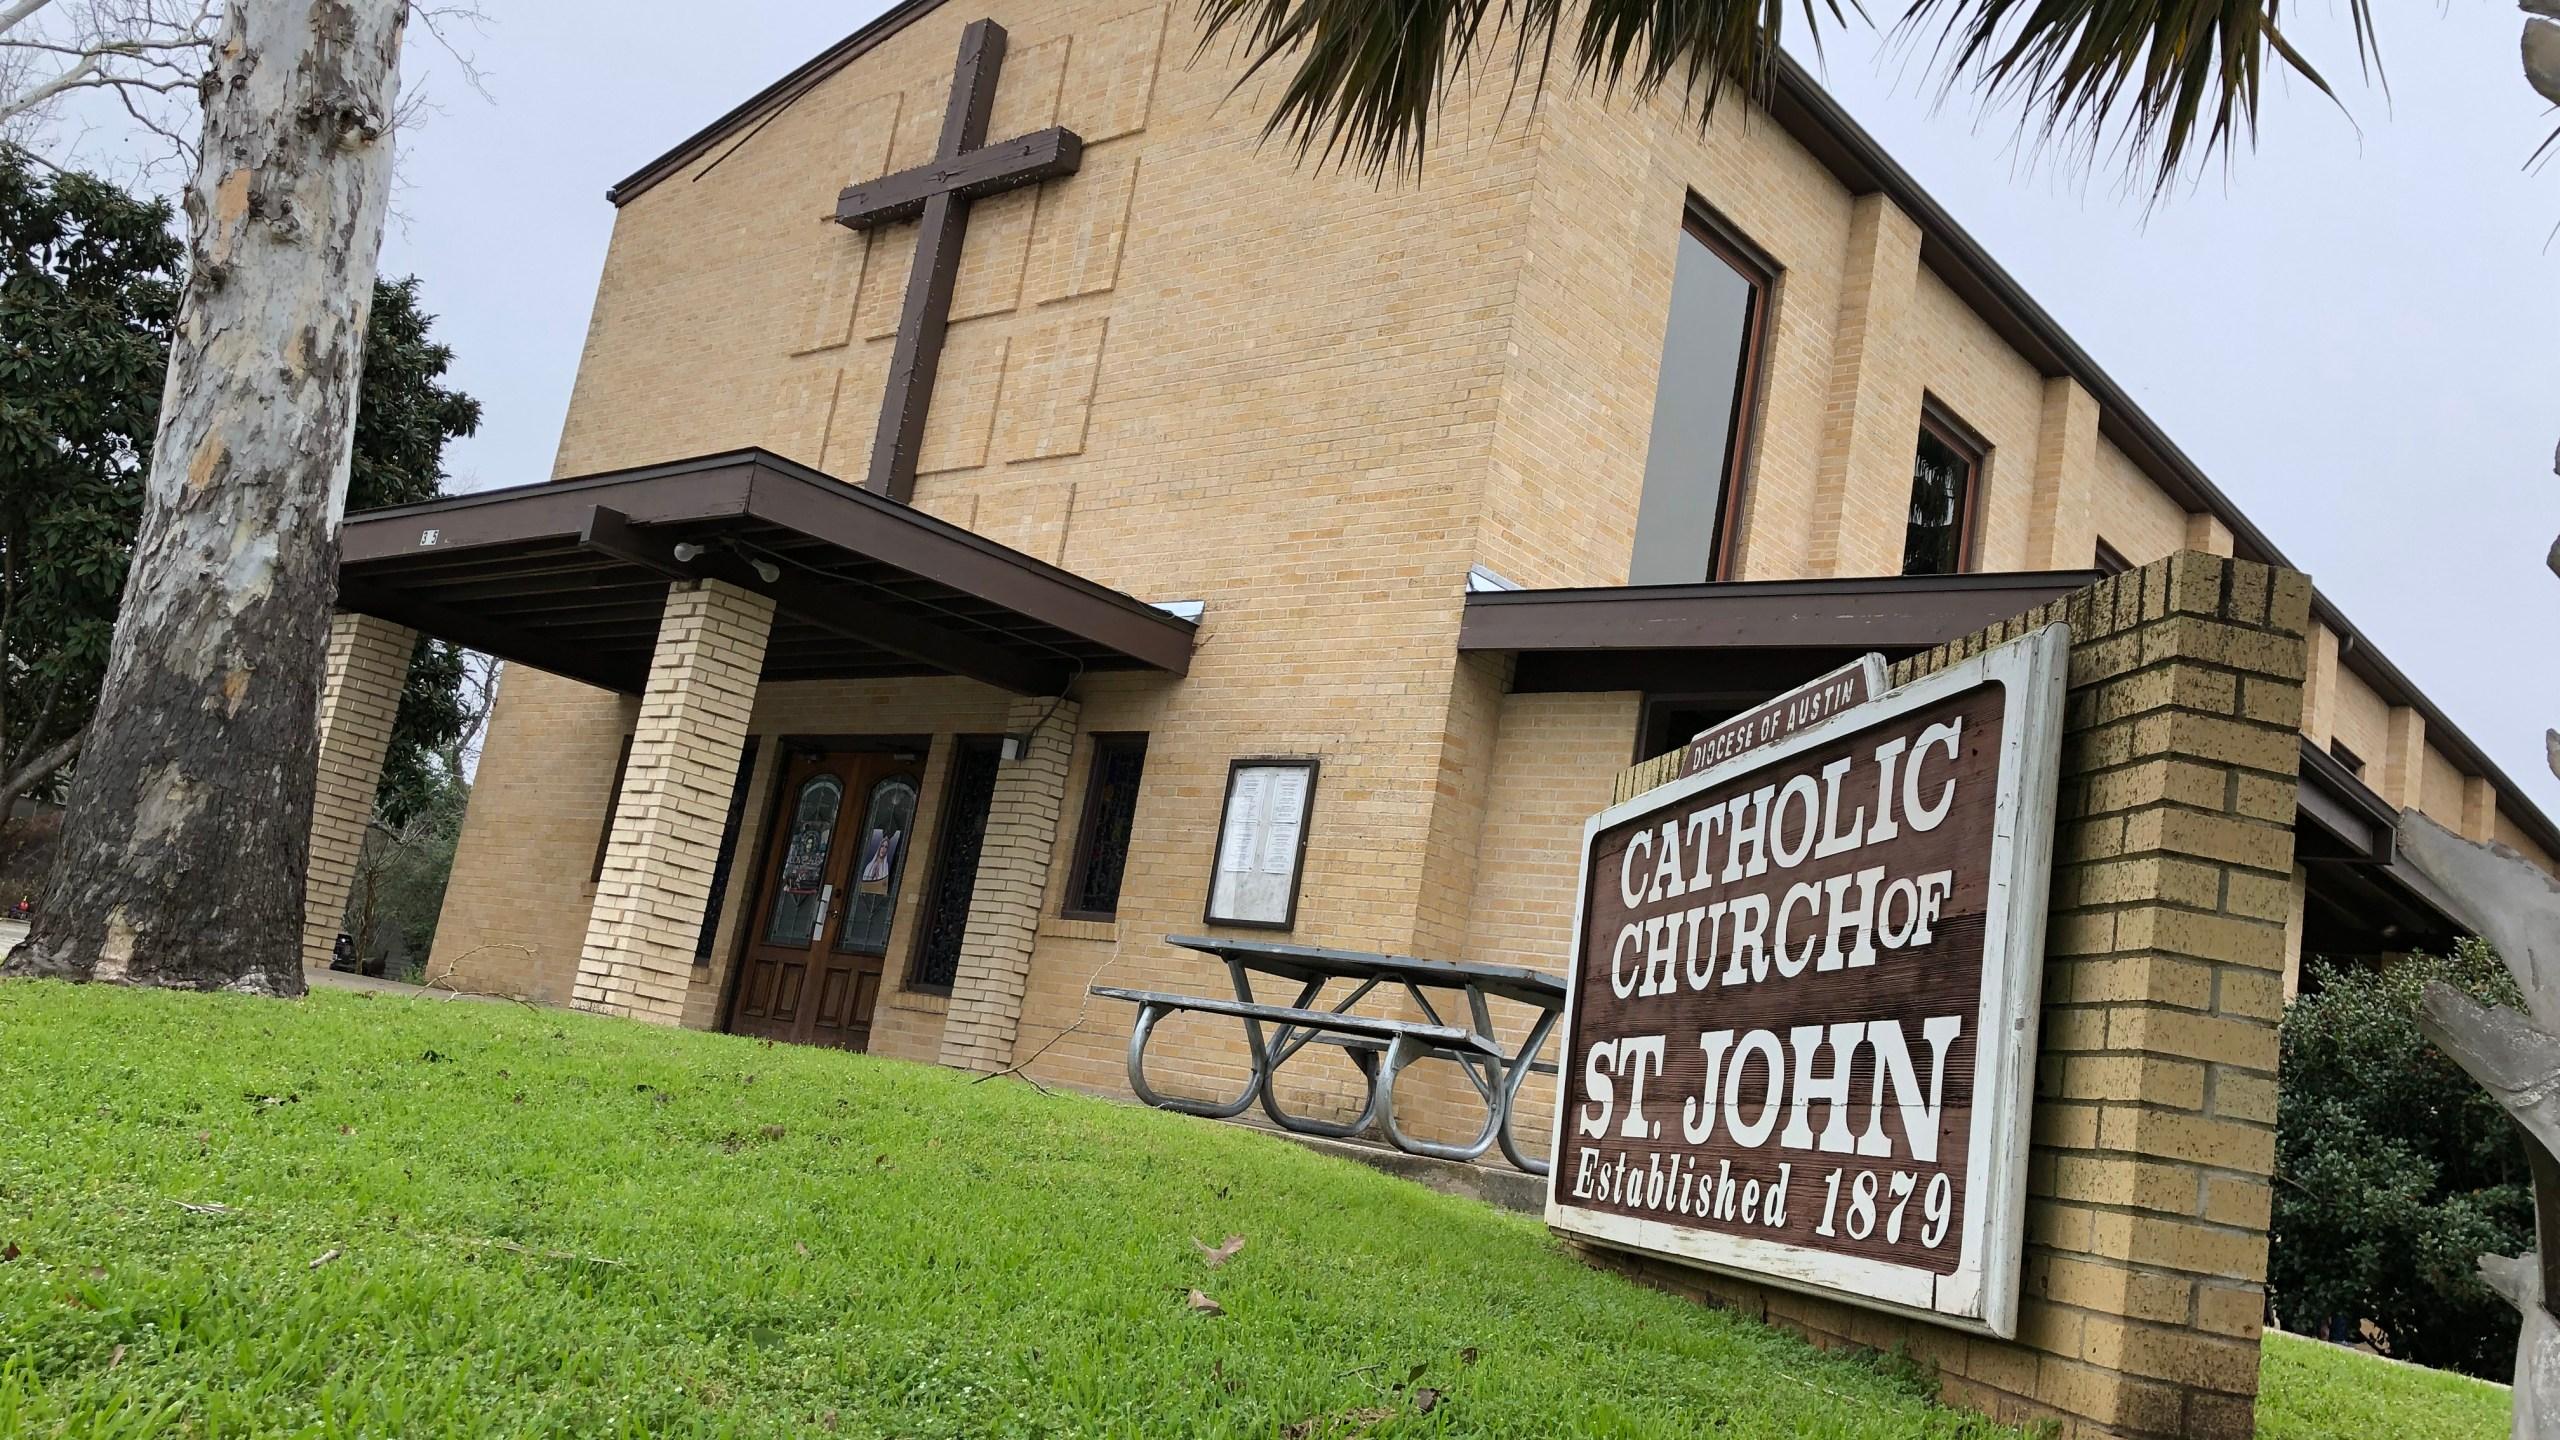 ST. JOHN CATHOLIC CHURCH IN LULING